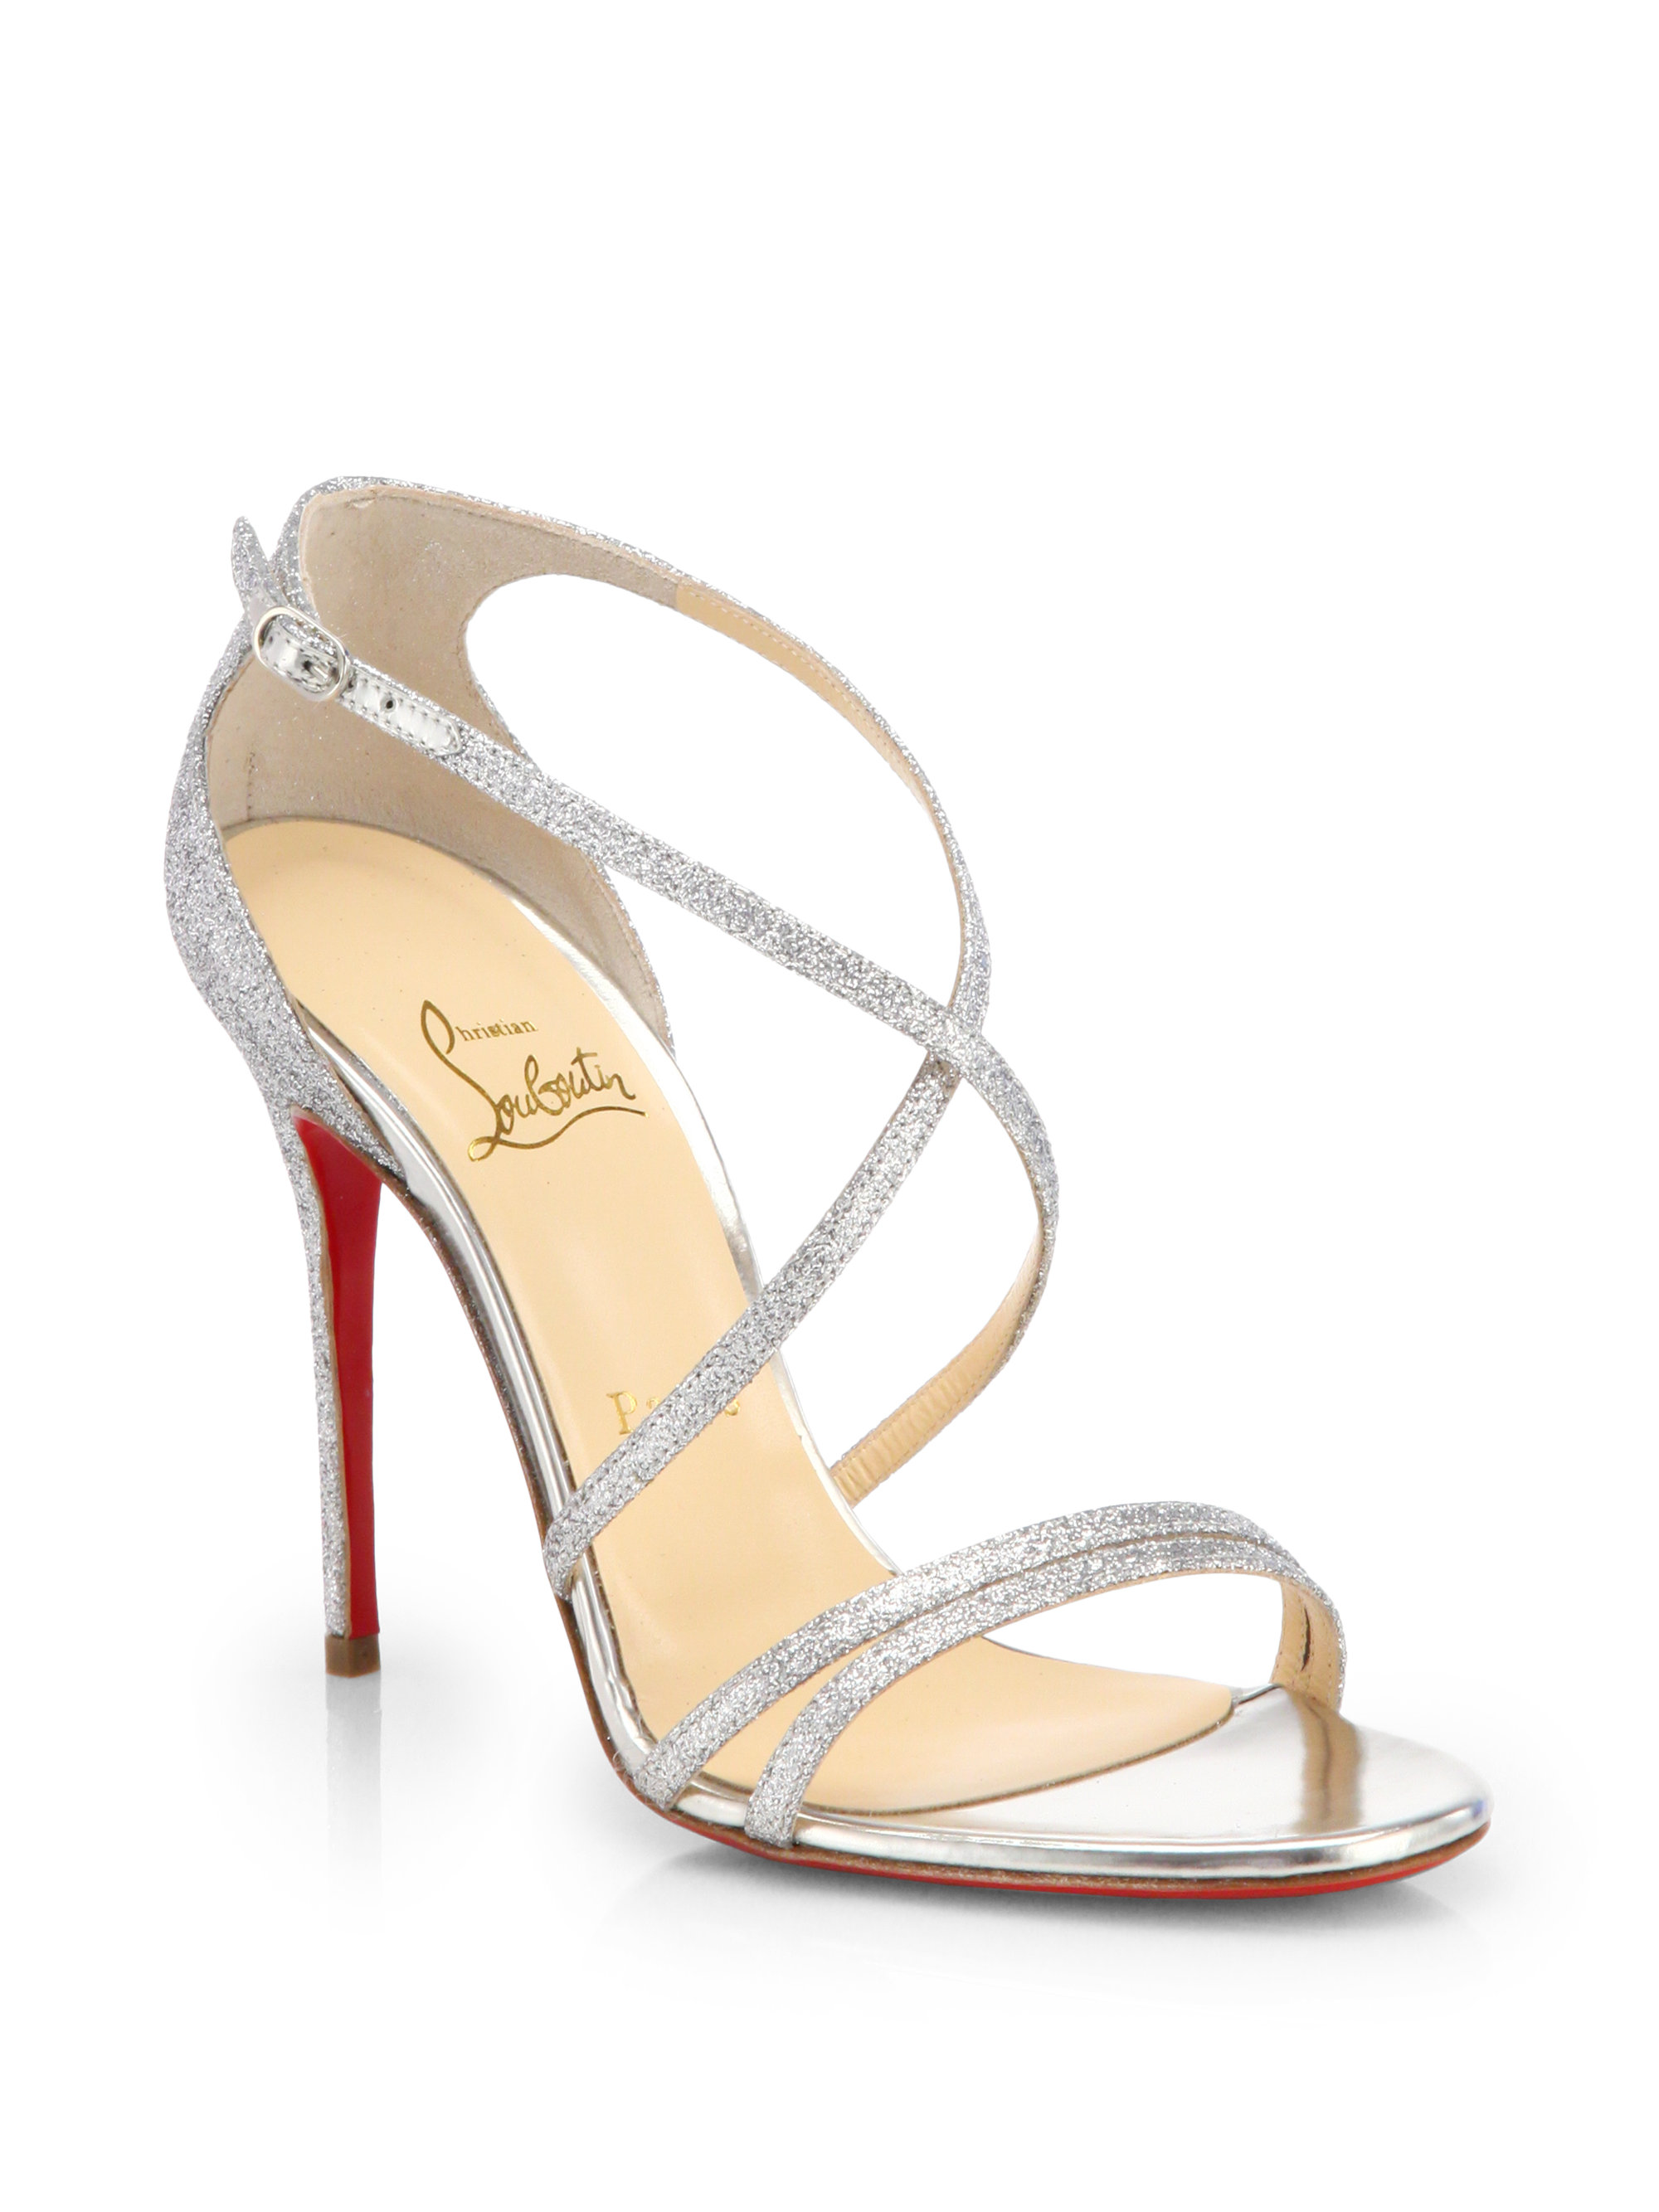 Christian Louboutin Gwynitta Glitter Sandals In Silver